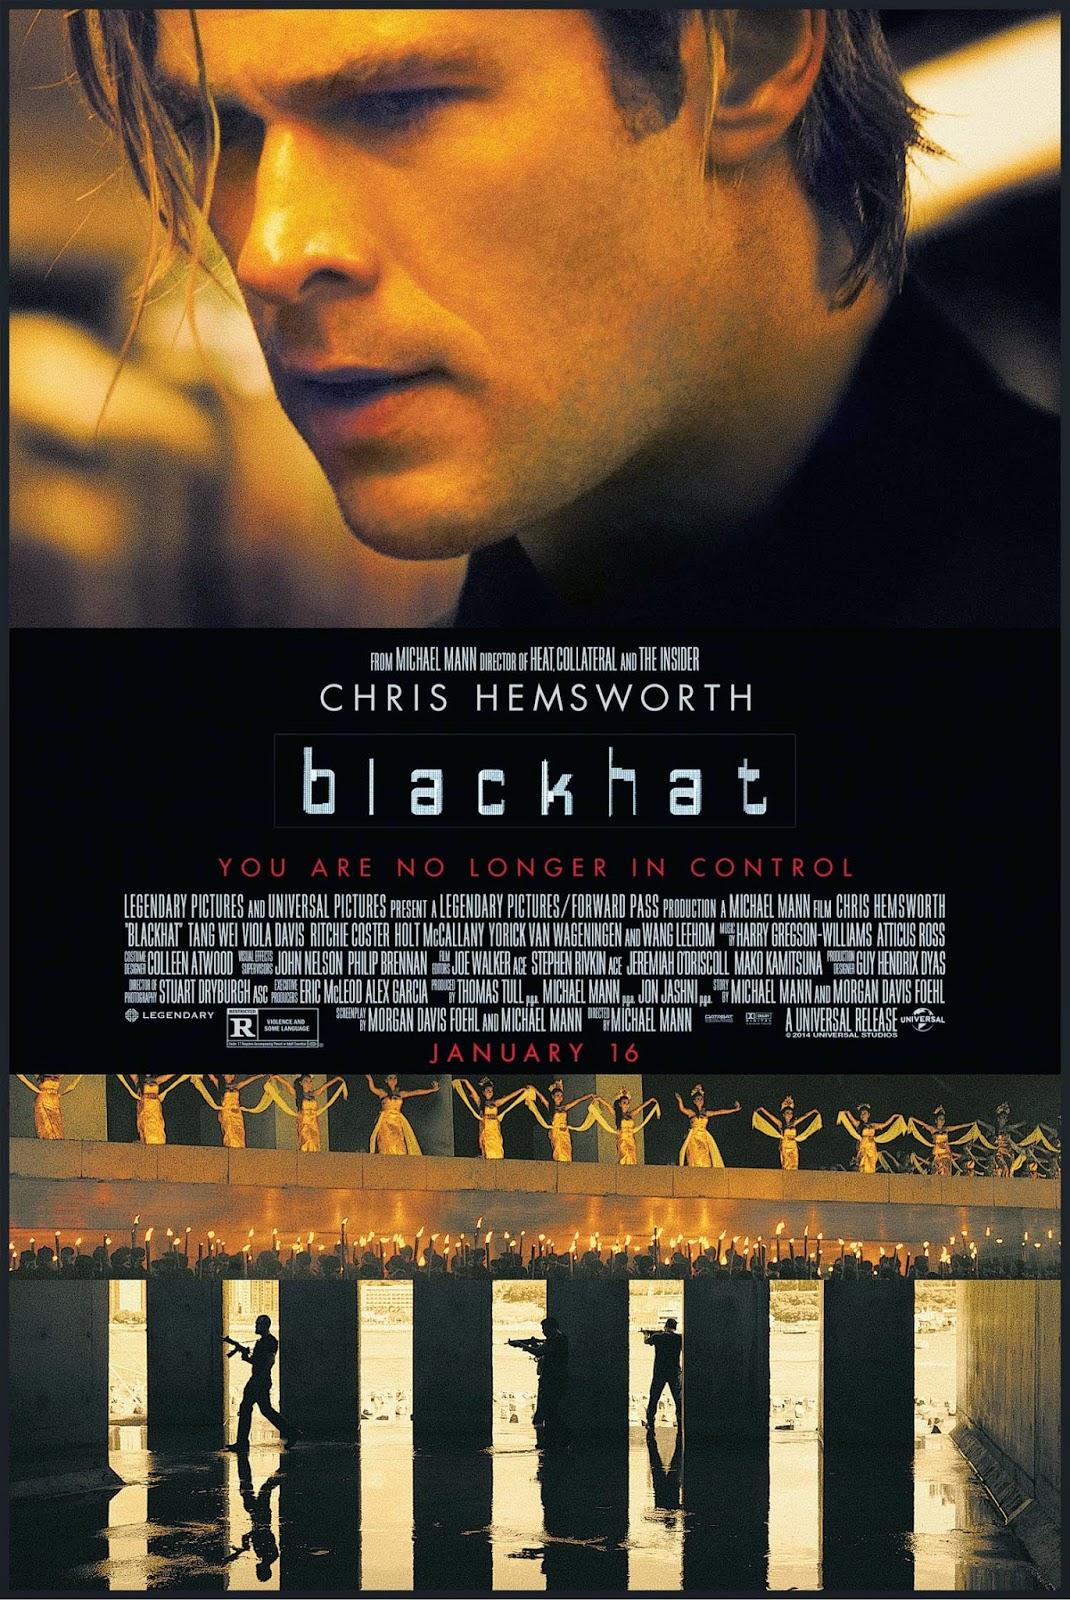 16f0402c8e1 Blackhat - Movie Review. Blackhat is a cyber terrorist